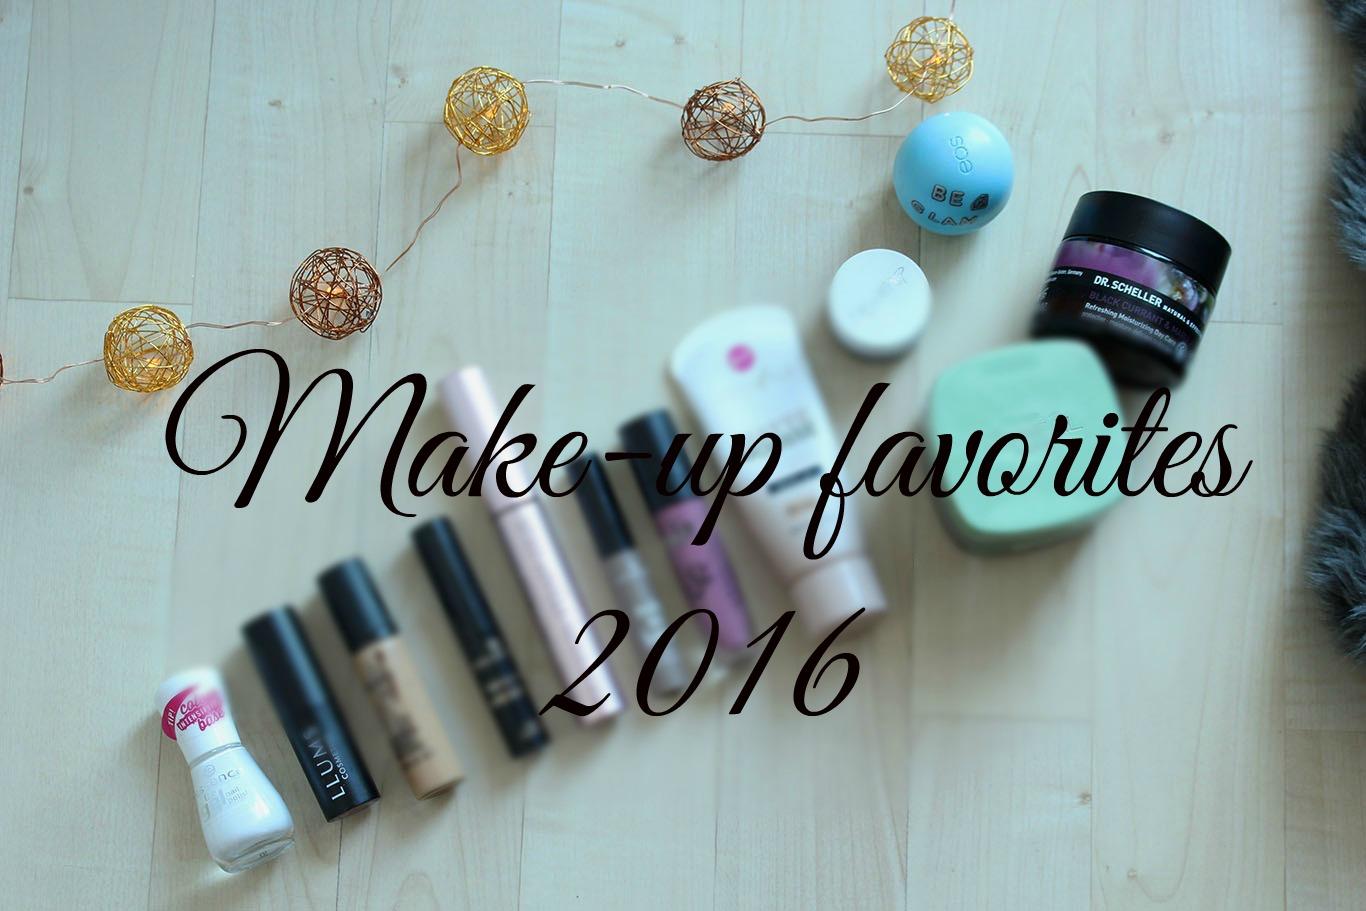 Make-up favorites 2016